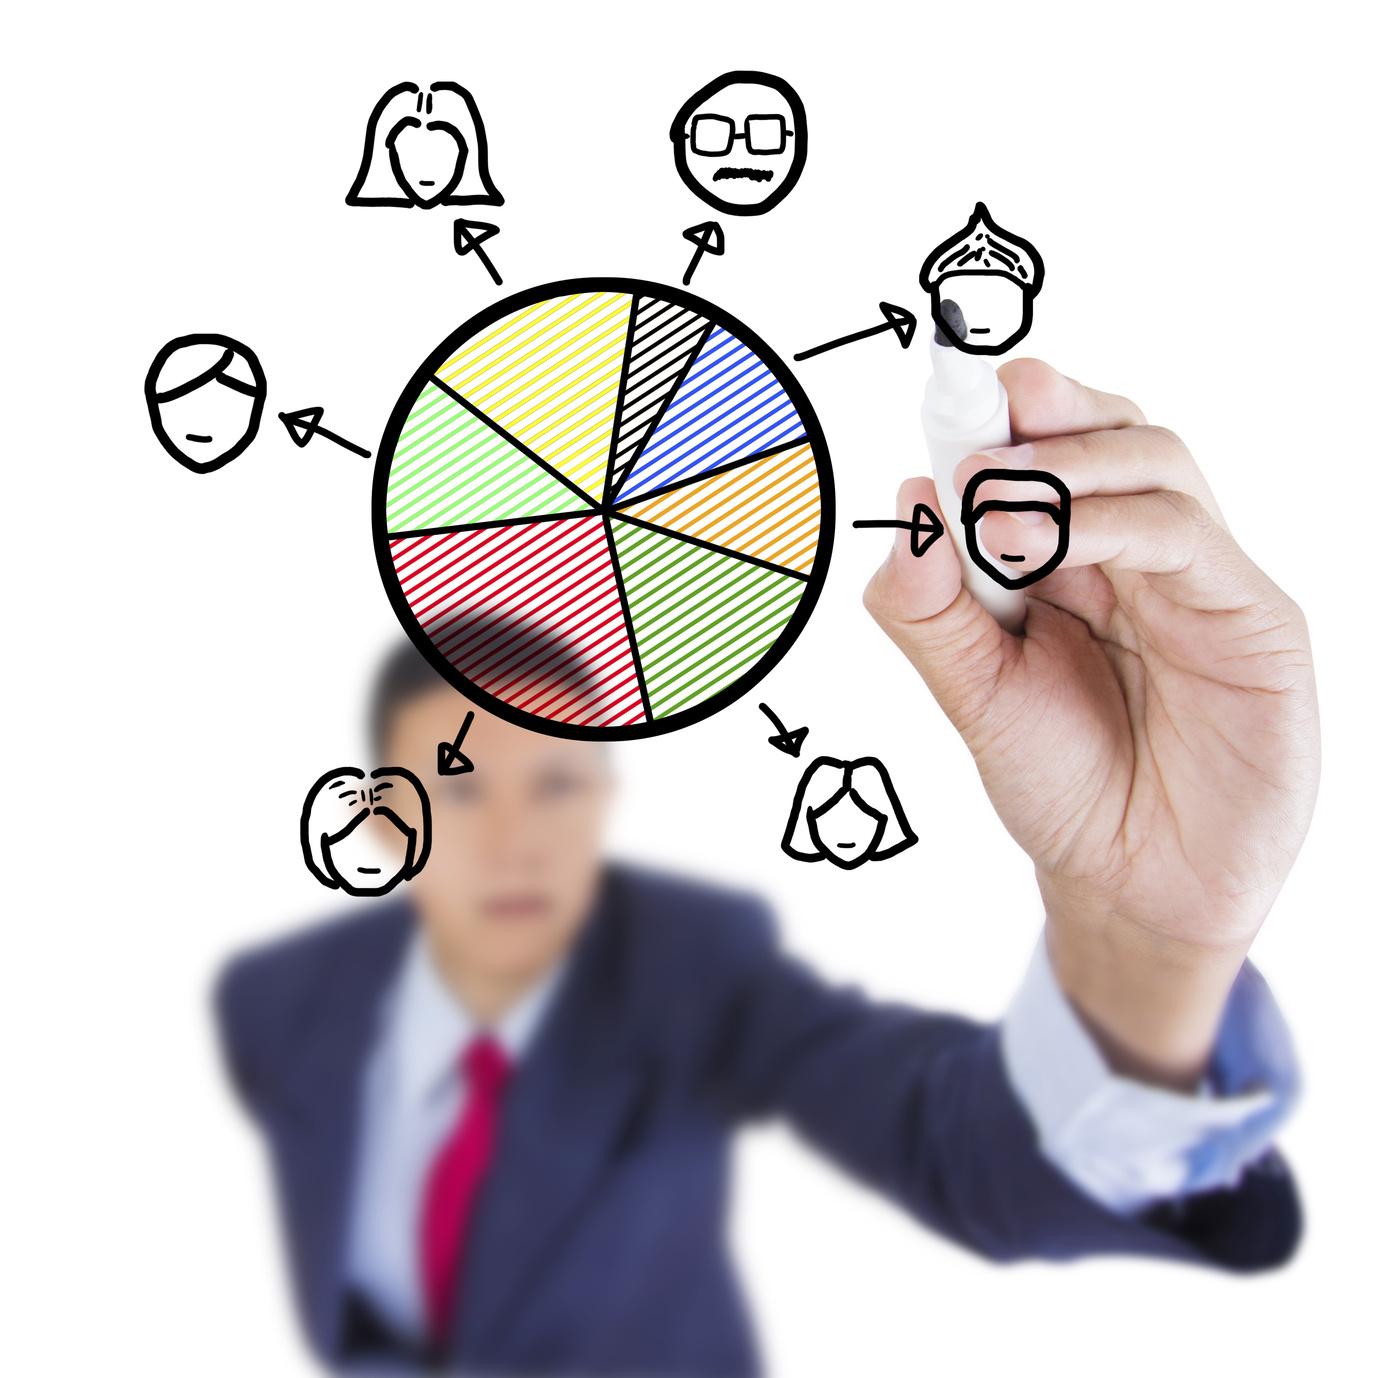 Balancing short-term employee efficiency with long-term organizational effectiveness